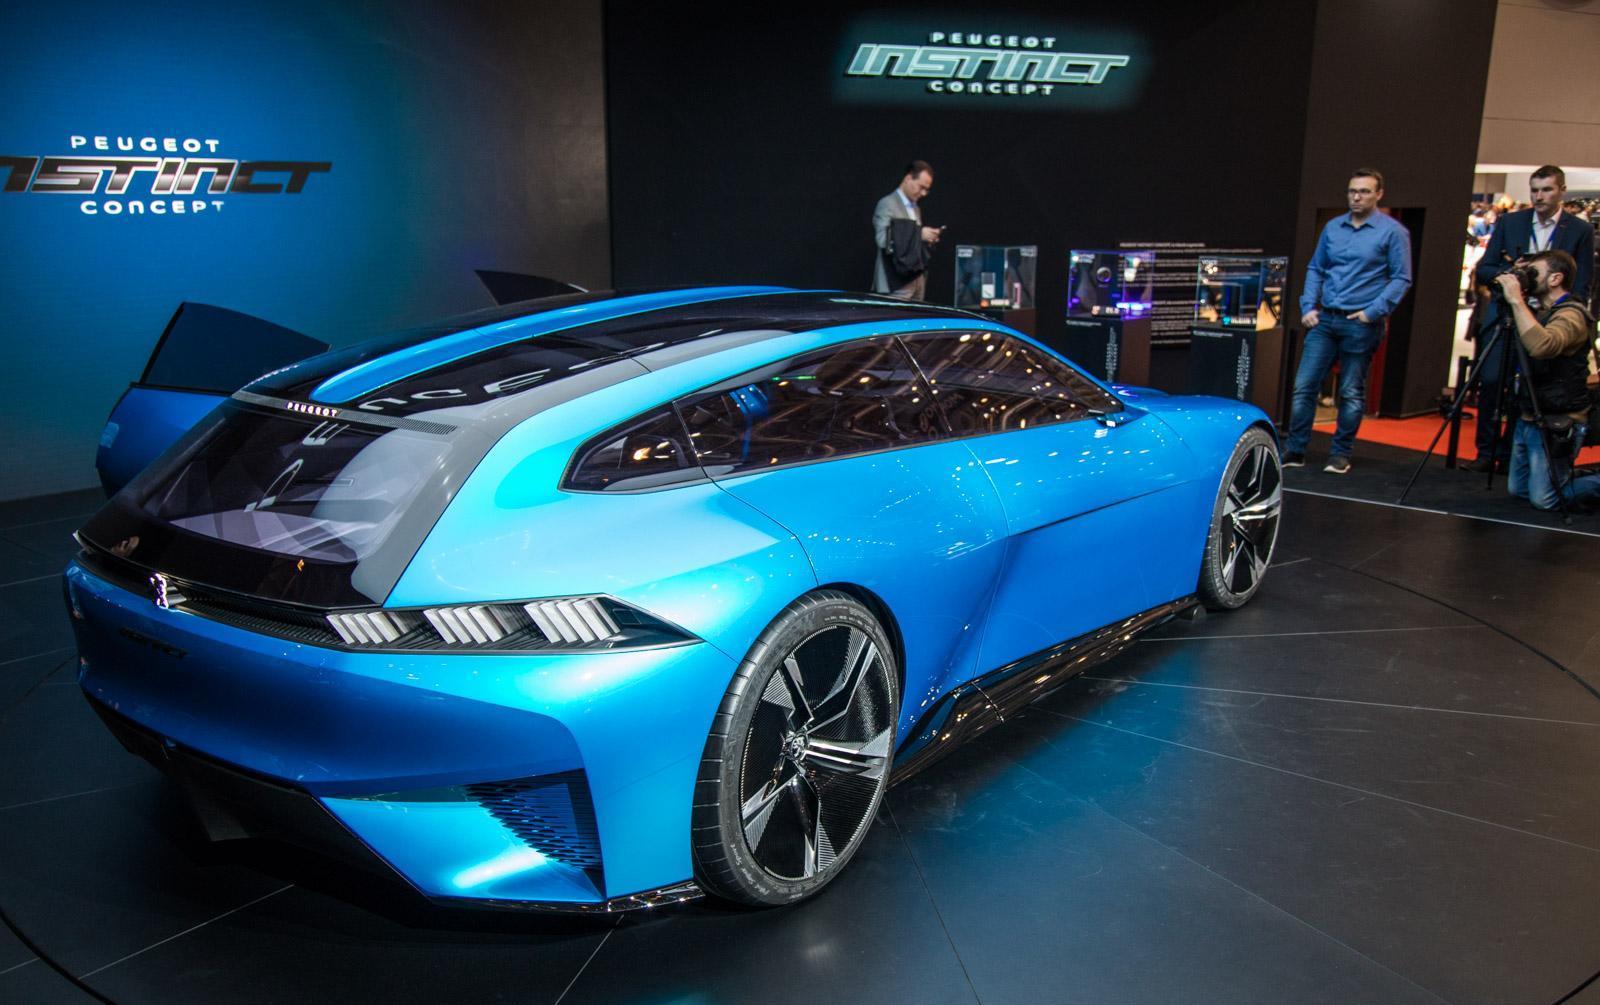 Peugeot-instinct-concept-018